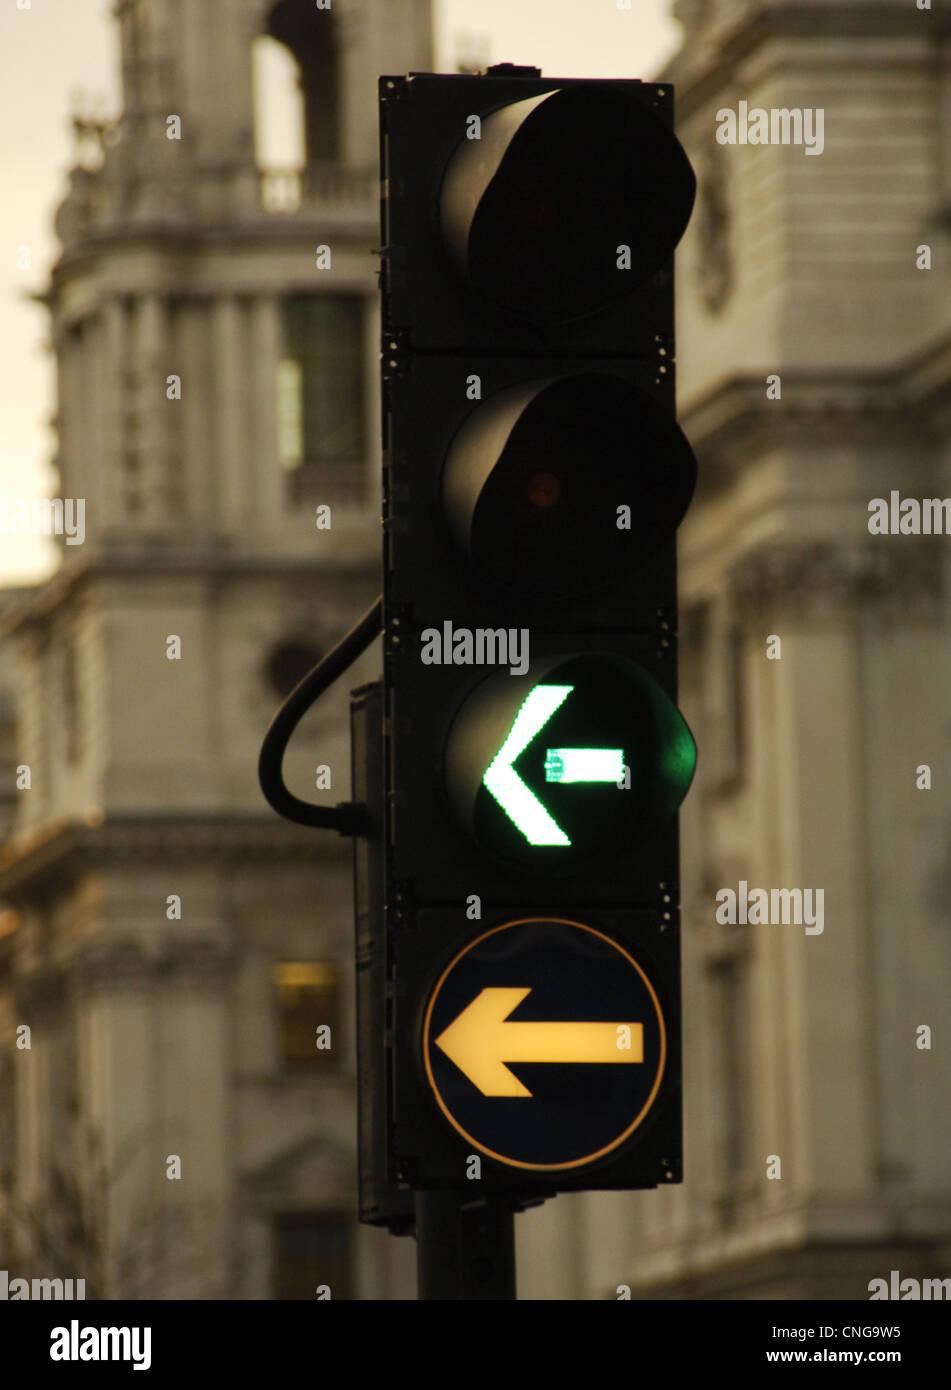 United Kingdom. England. London. Green light for vehicles that turn left. - Stock Image